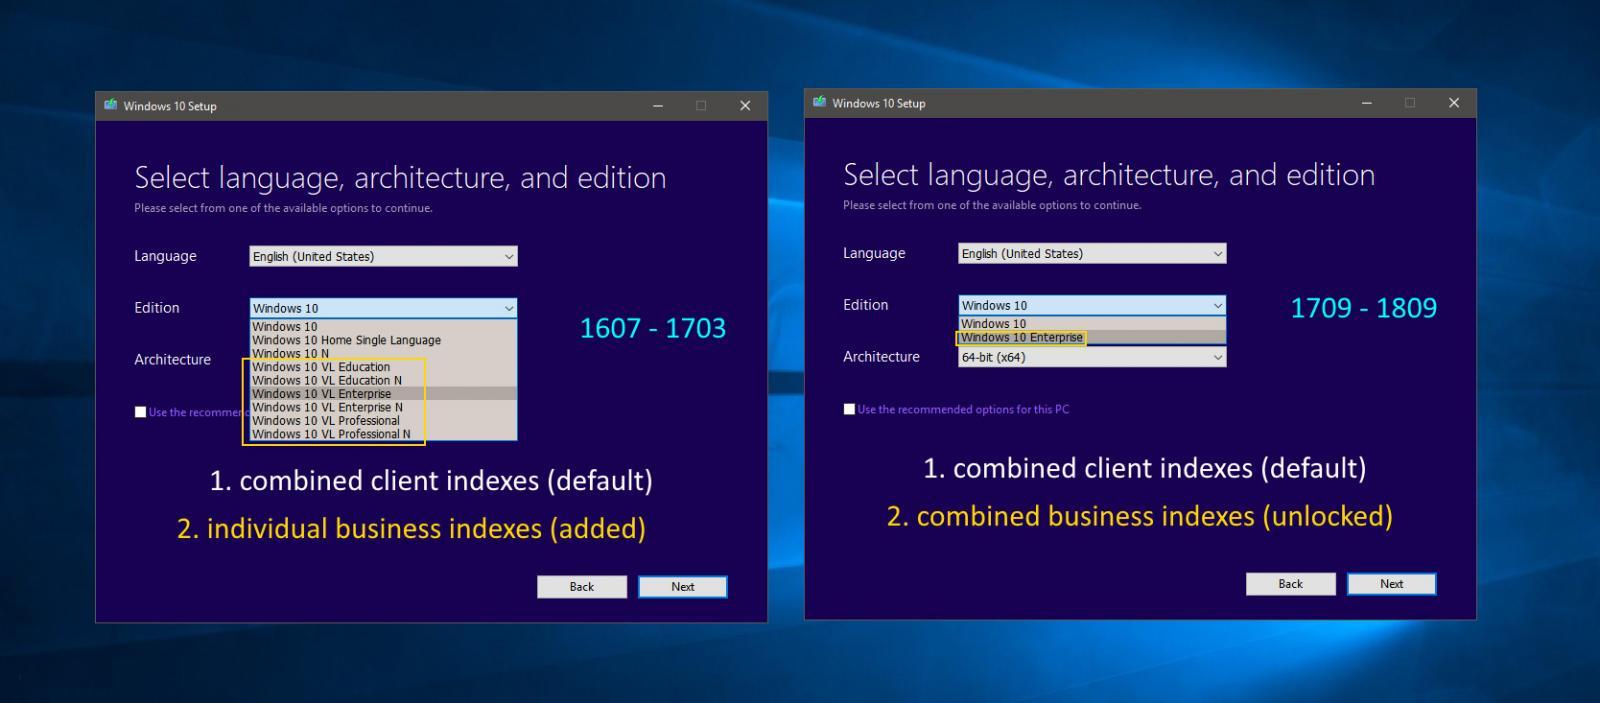 Media Creation Tool Media Selection based on Windows 10 version